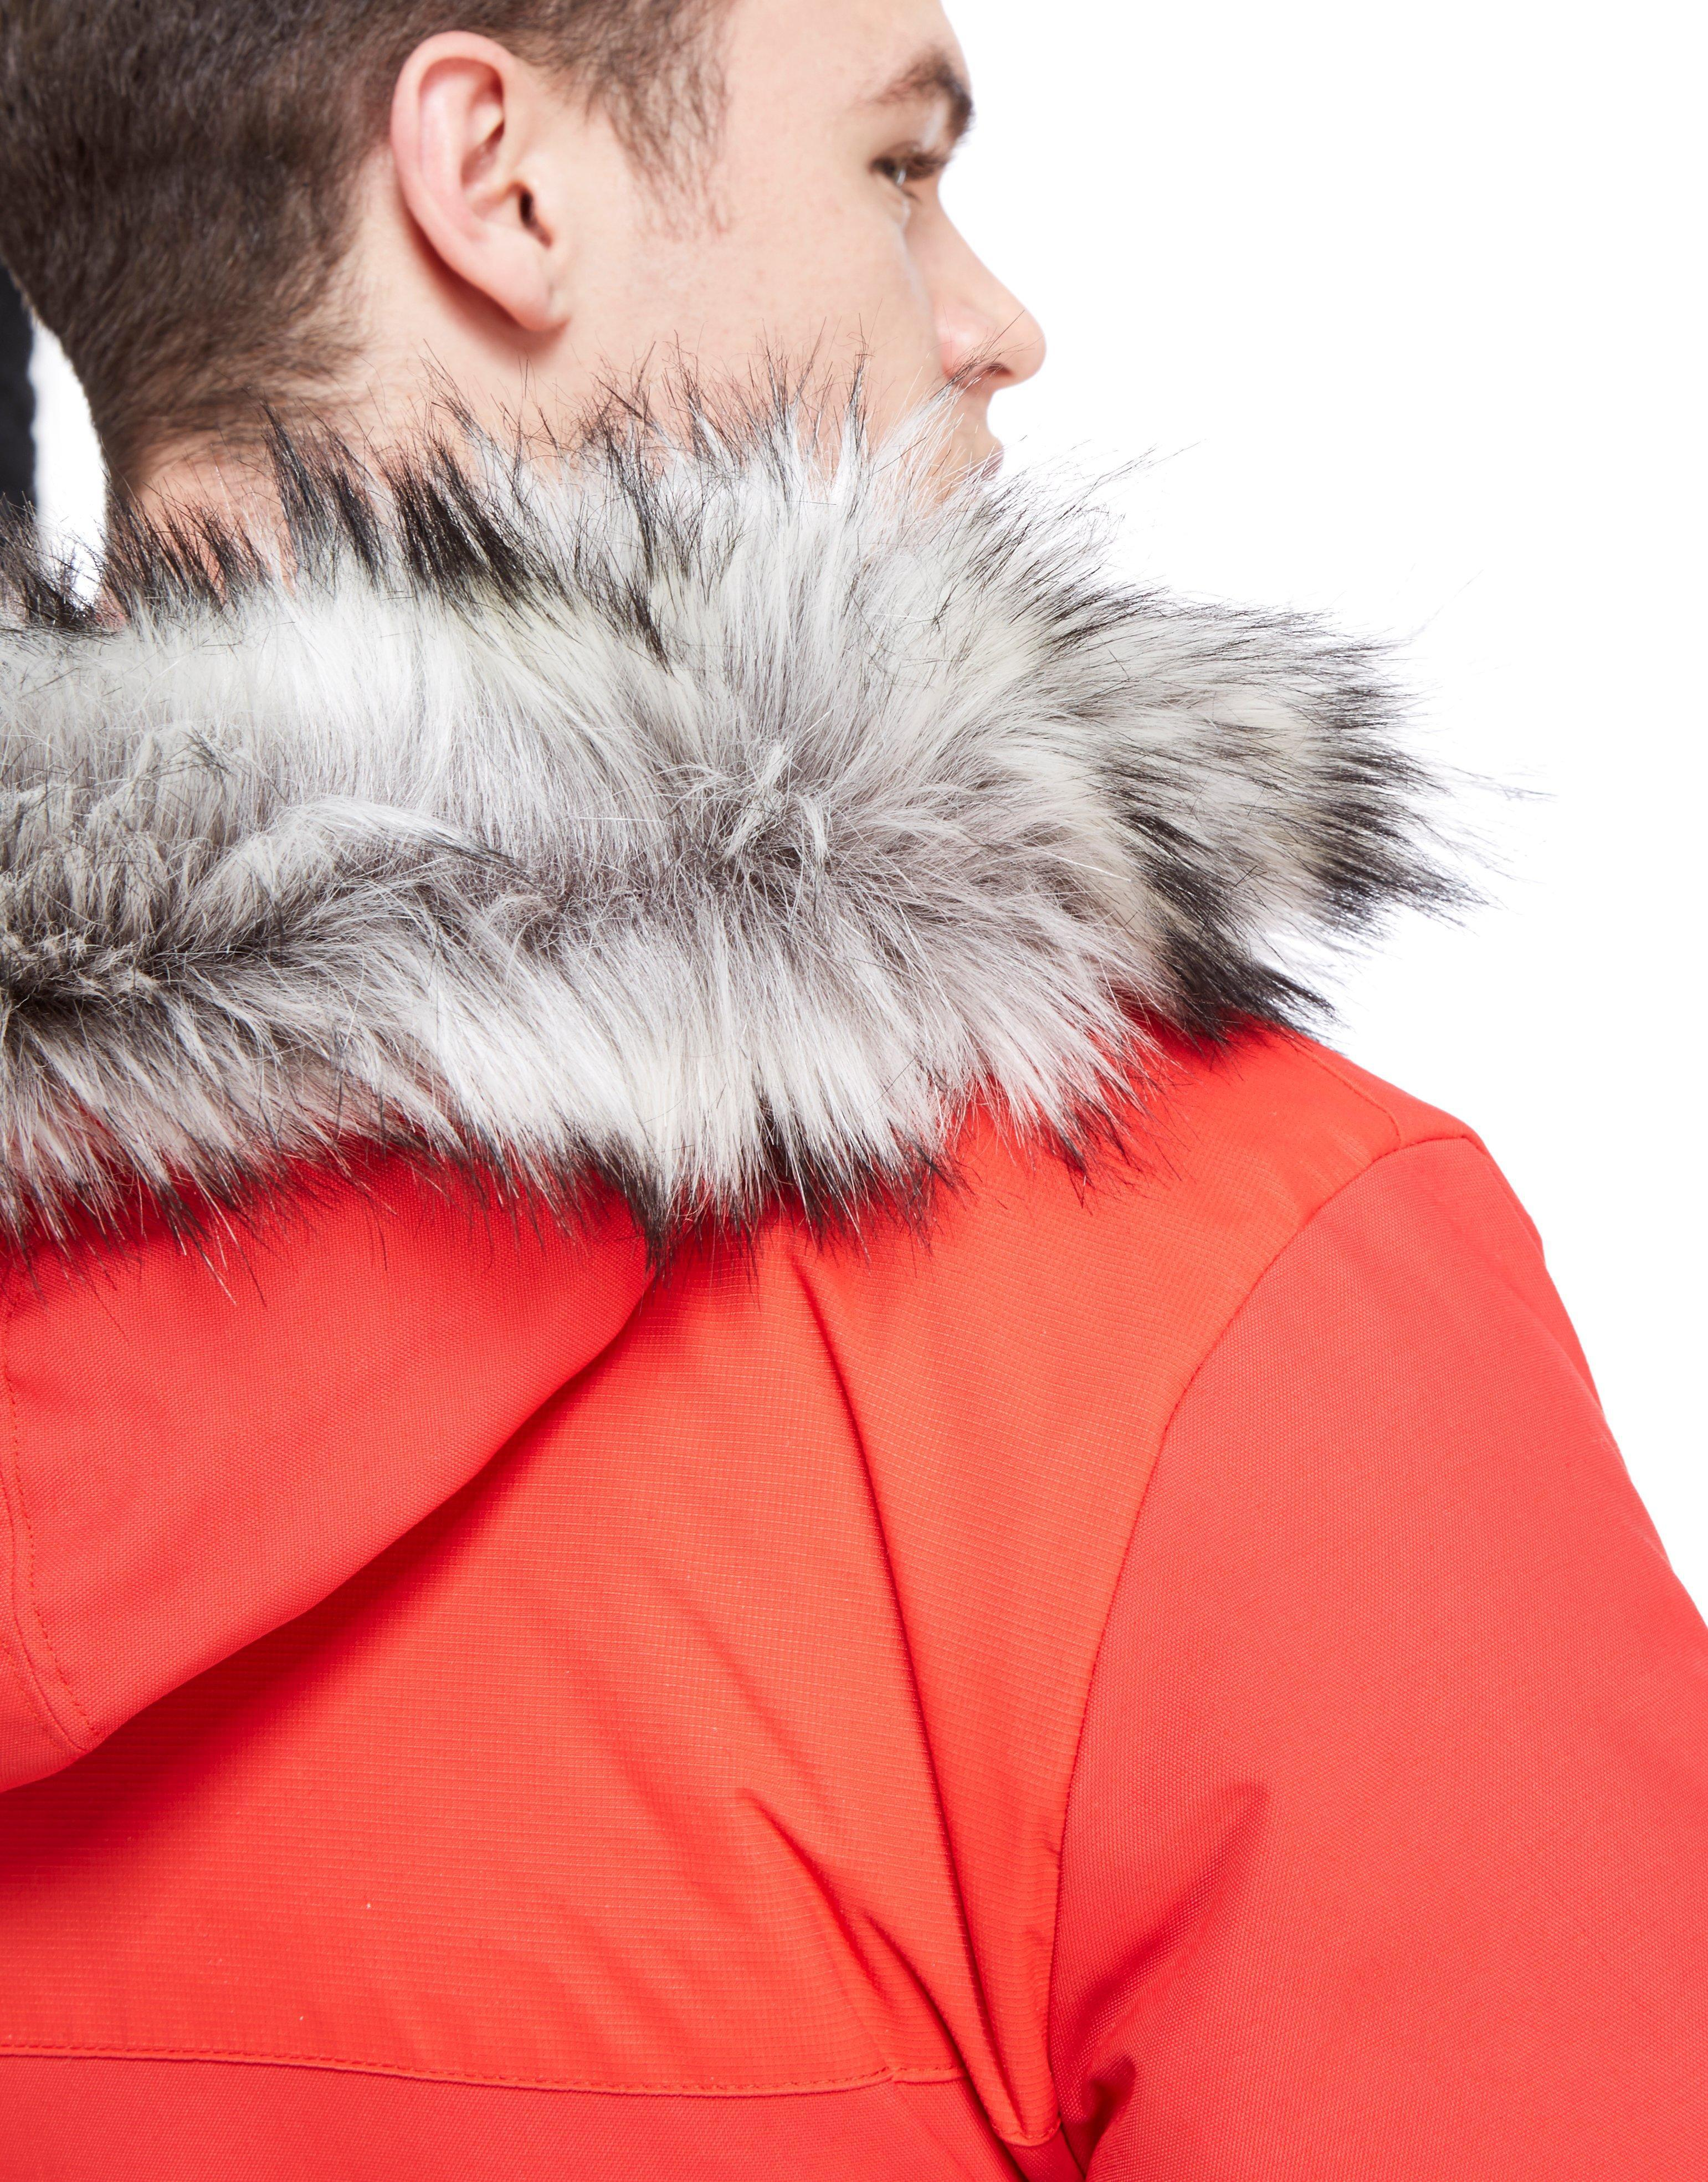 Lyst Adidas Originals Trefoil Fur Parka Jacket In Red